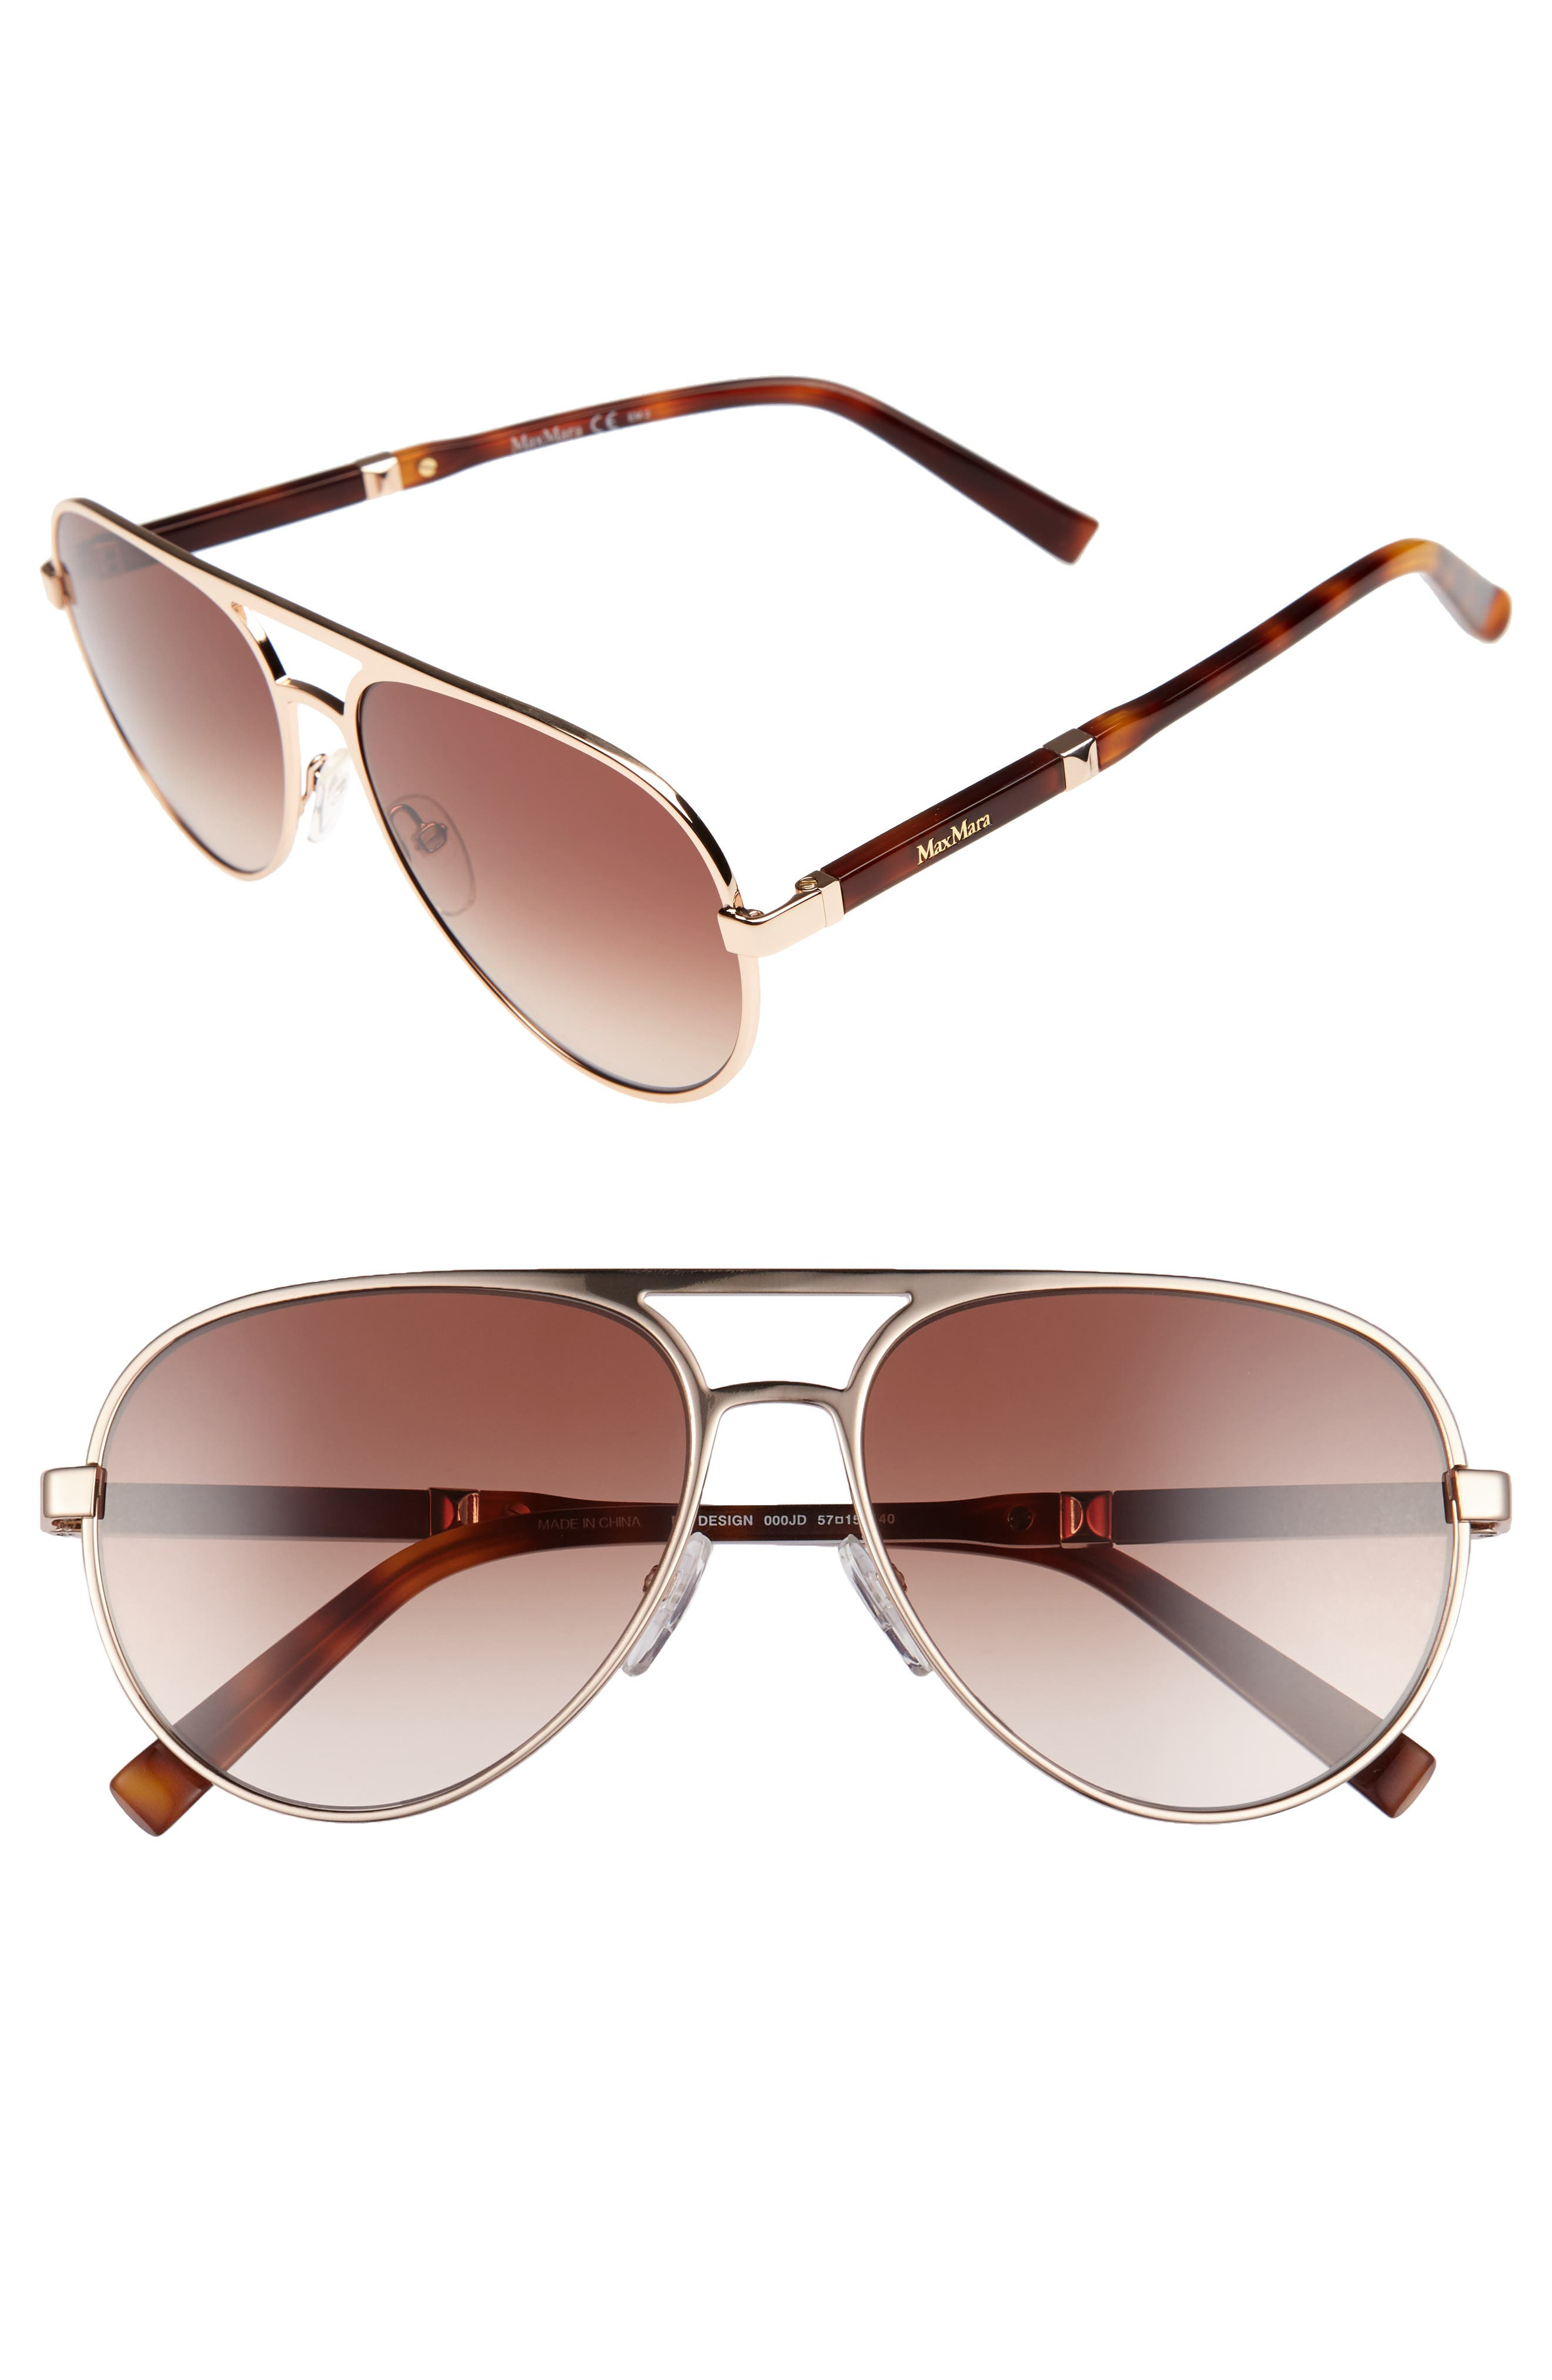 Desigs 57mm Gradient Aviator Sunglasses,                             Main thumbnail 1, color,                             710